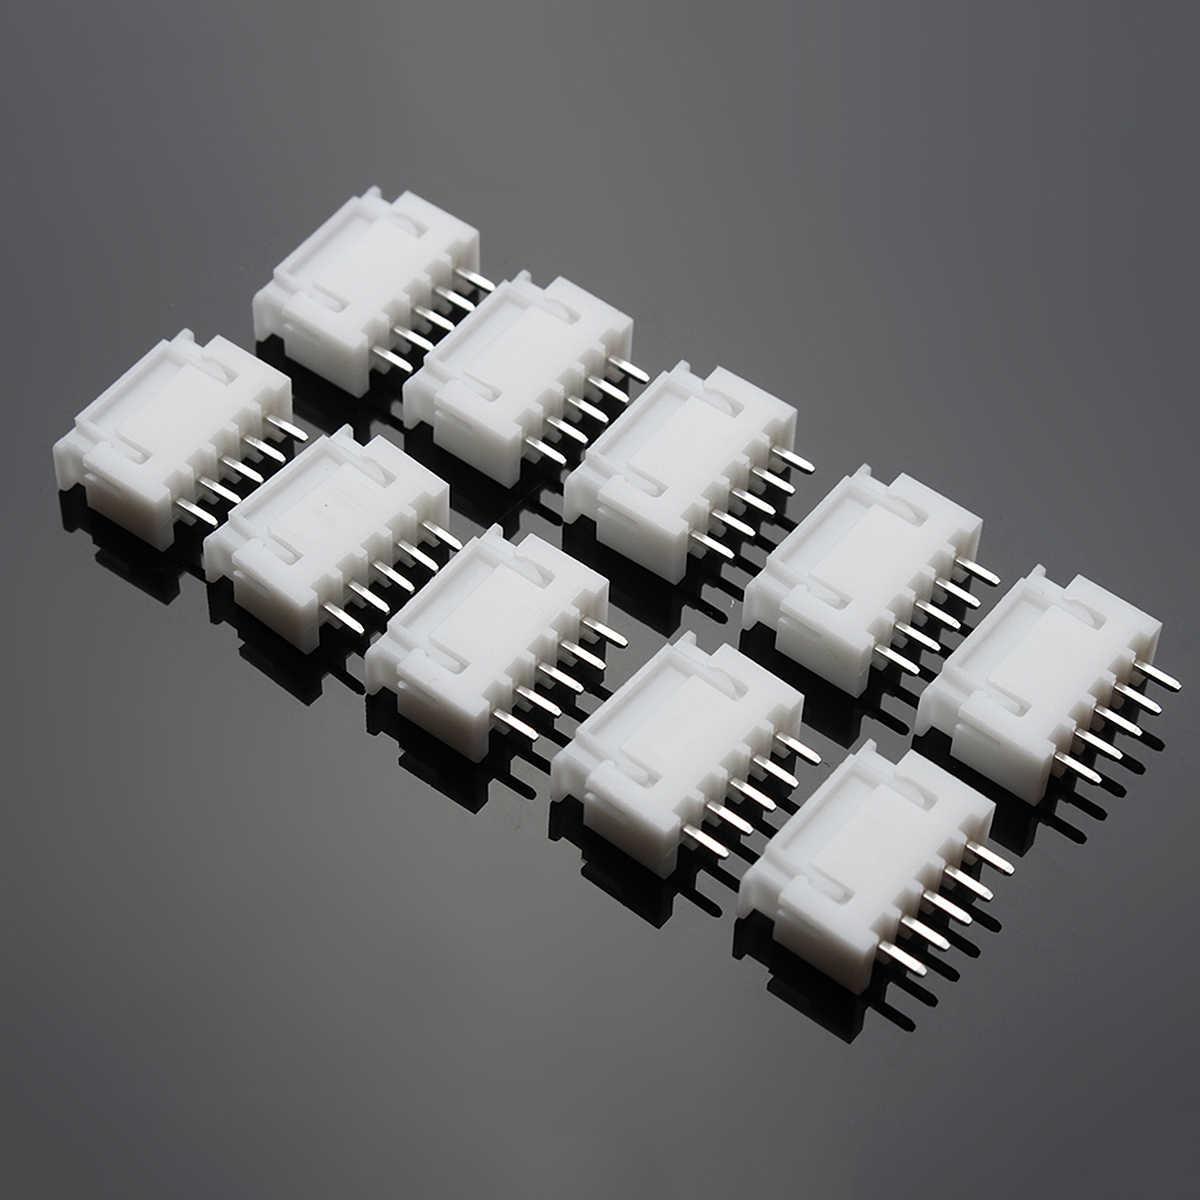 10 шт./компл. 4S 5 Pin 2,54 мм LiPo Батарея баланс разъем Корпус модель